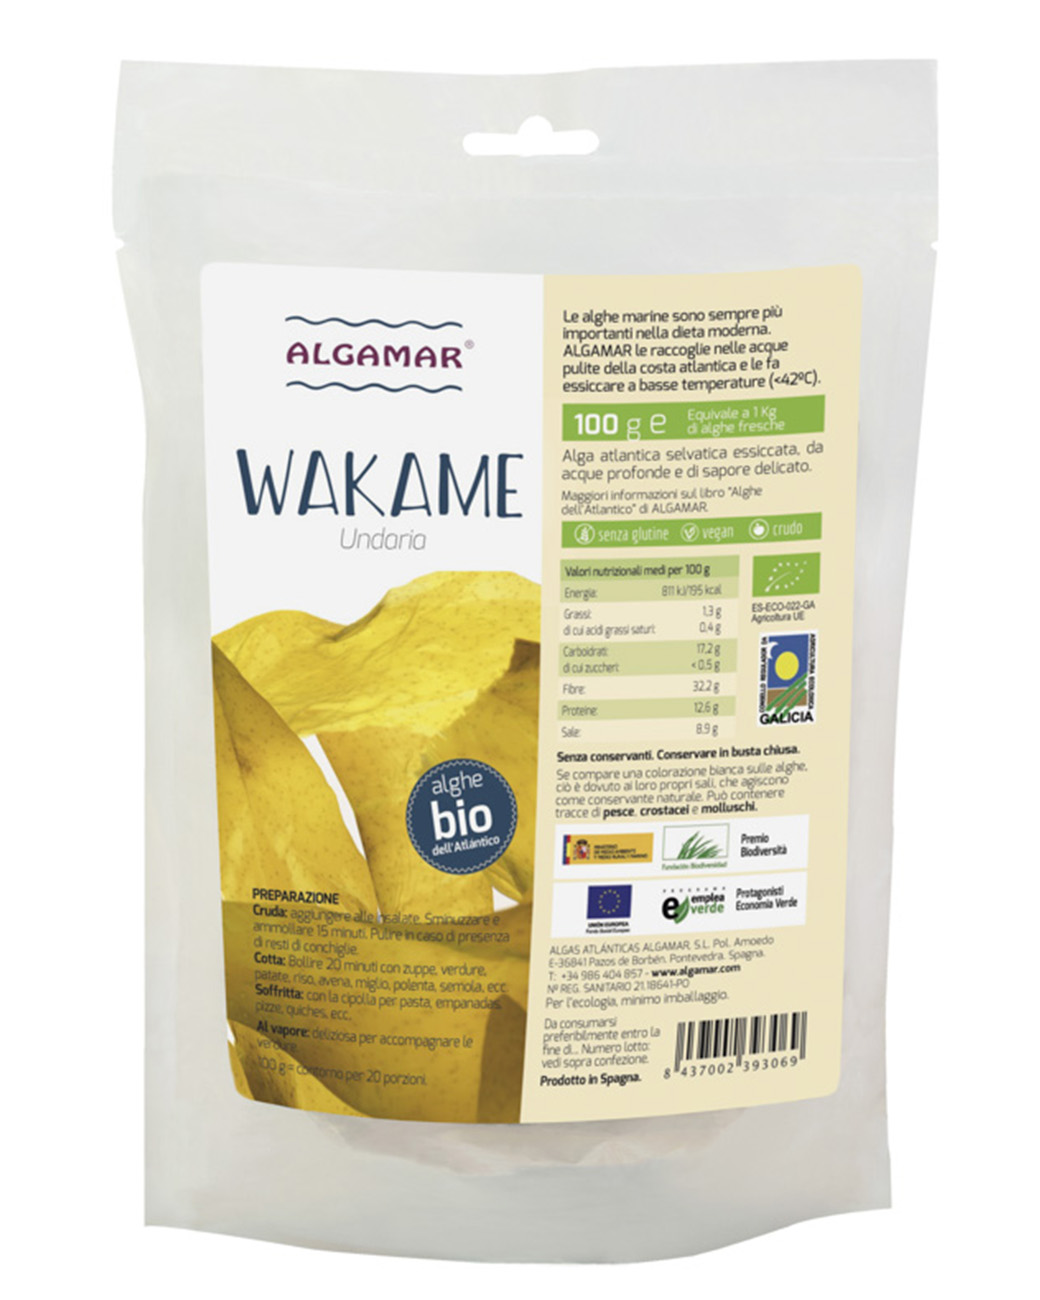 07-algamar-wakame-100g-italia